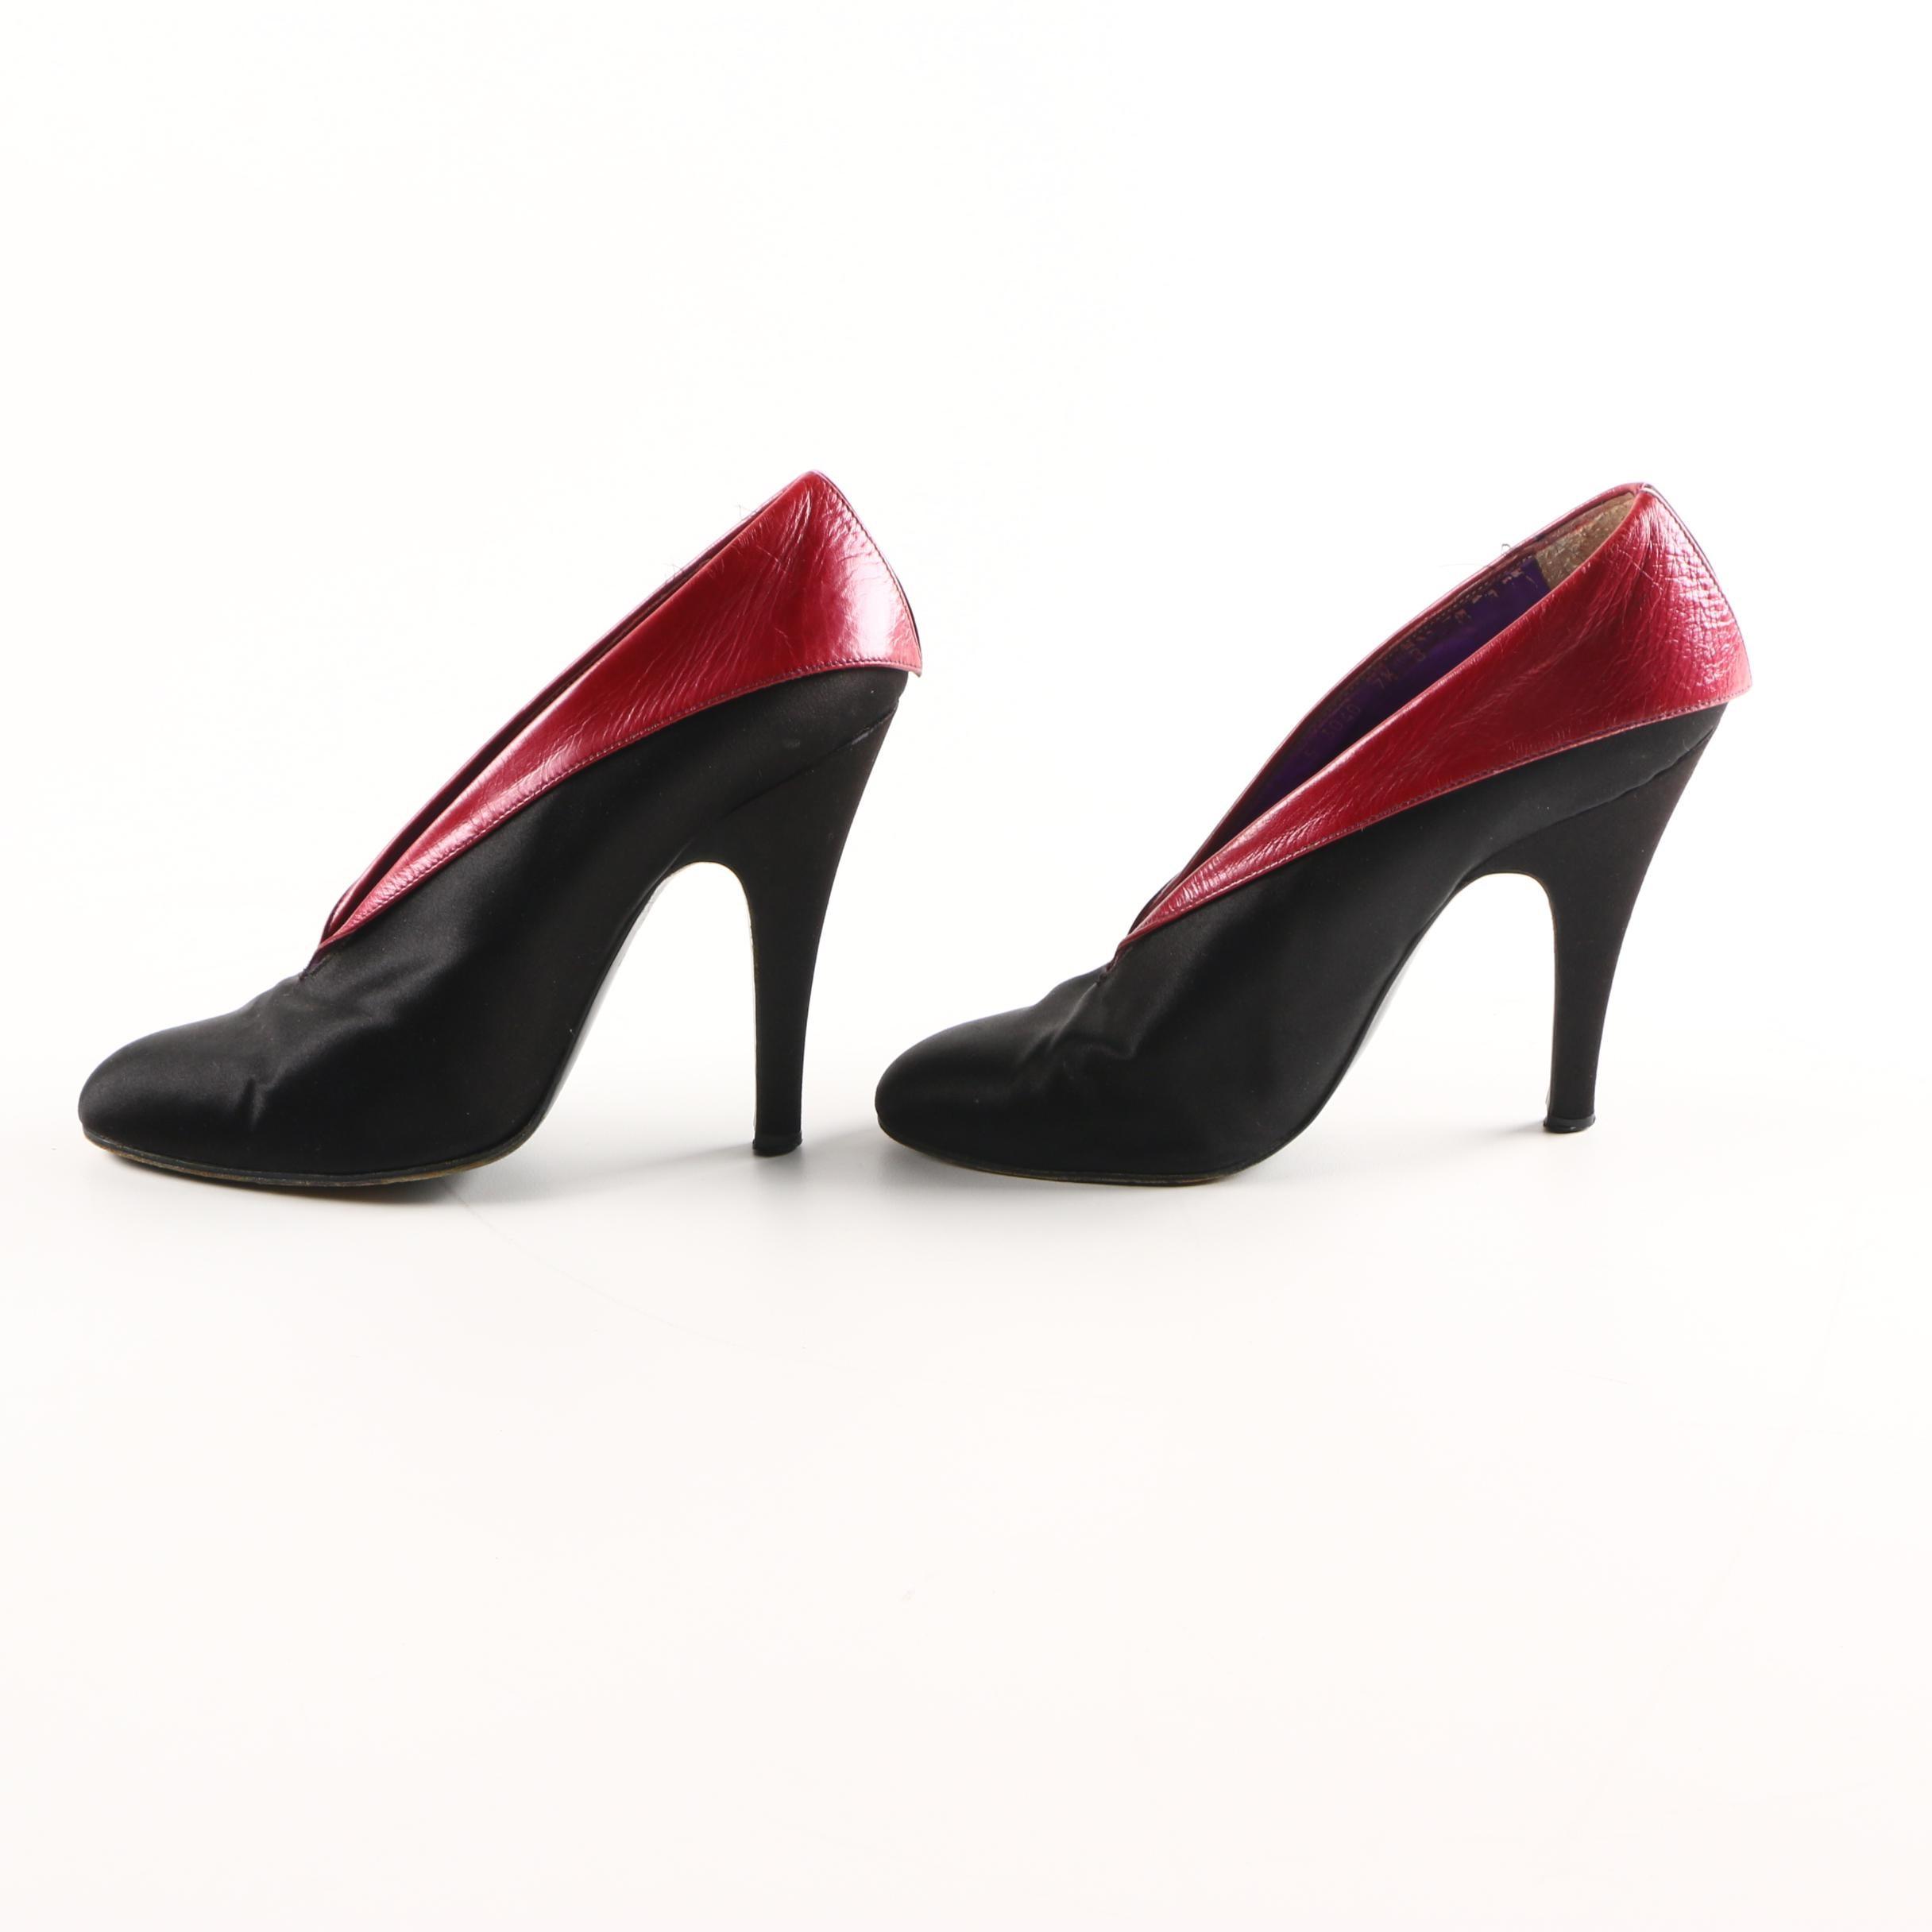 Pancaldi Red Leather Trimmed Black Satin Heels